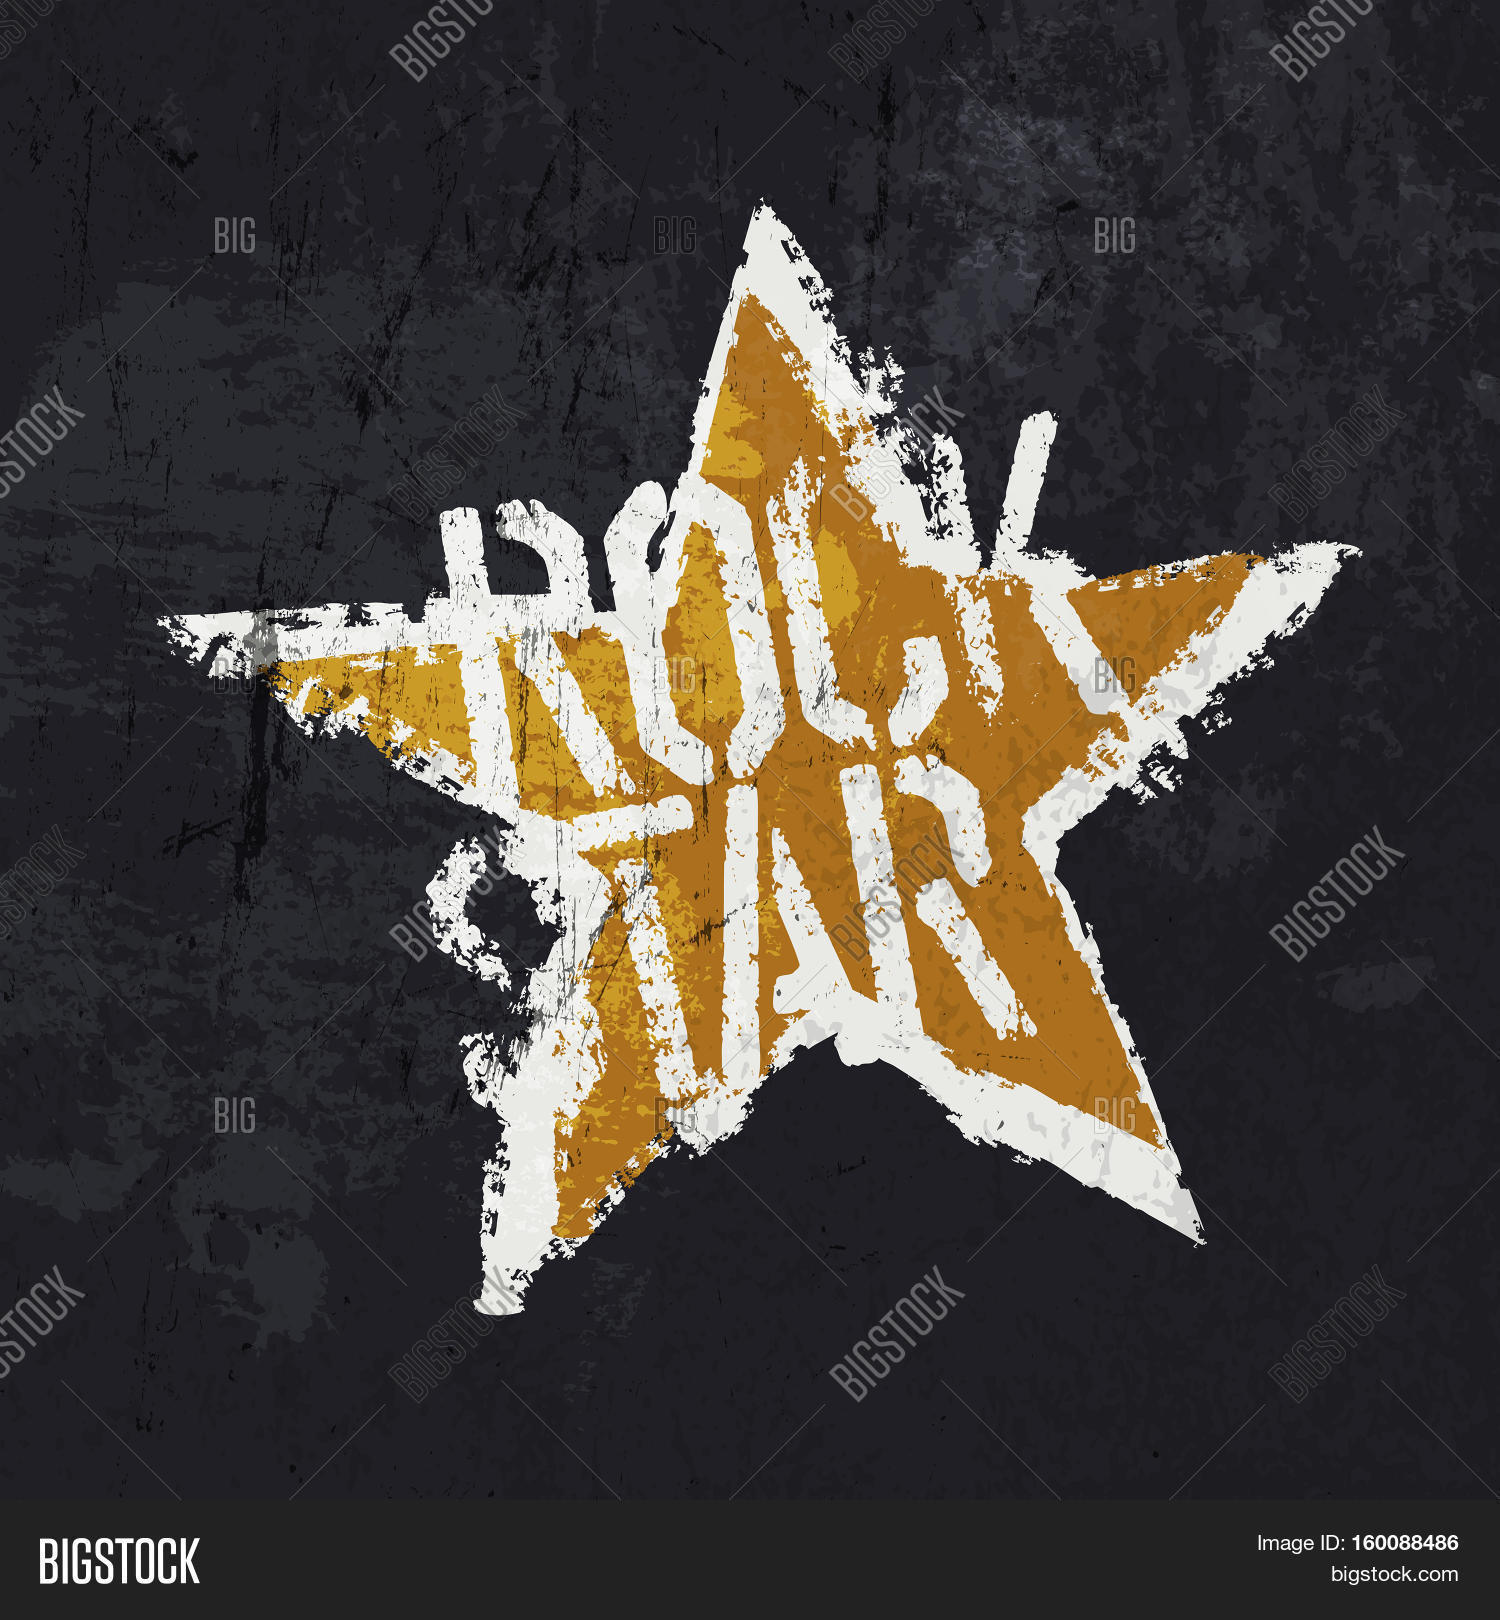 Grunge Rockstar Image Photo Free Trial Bigstock